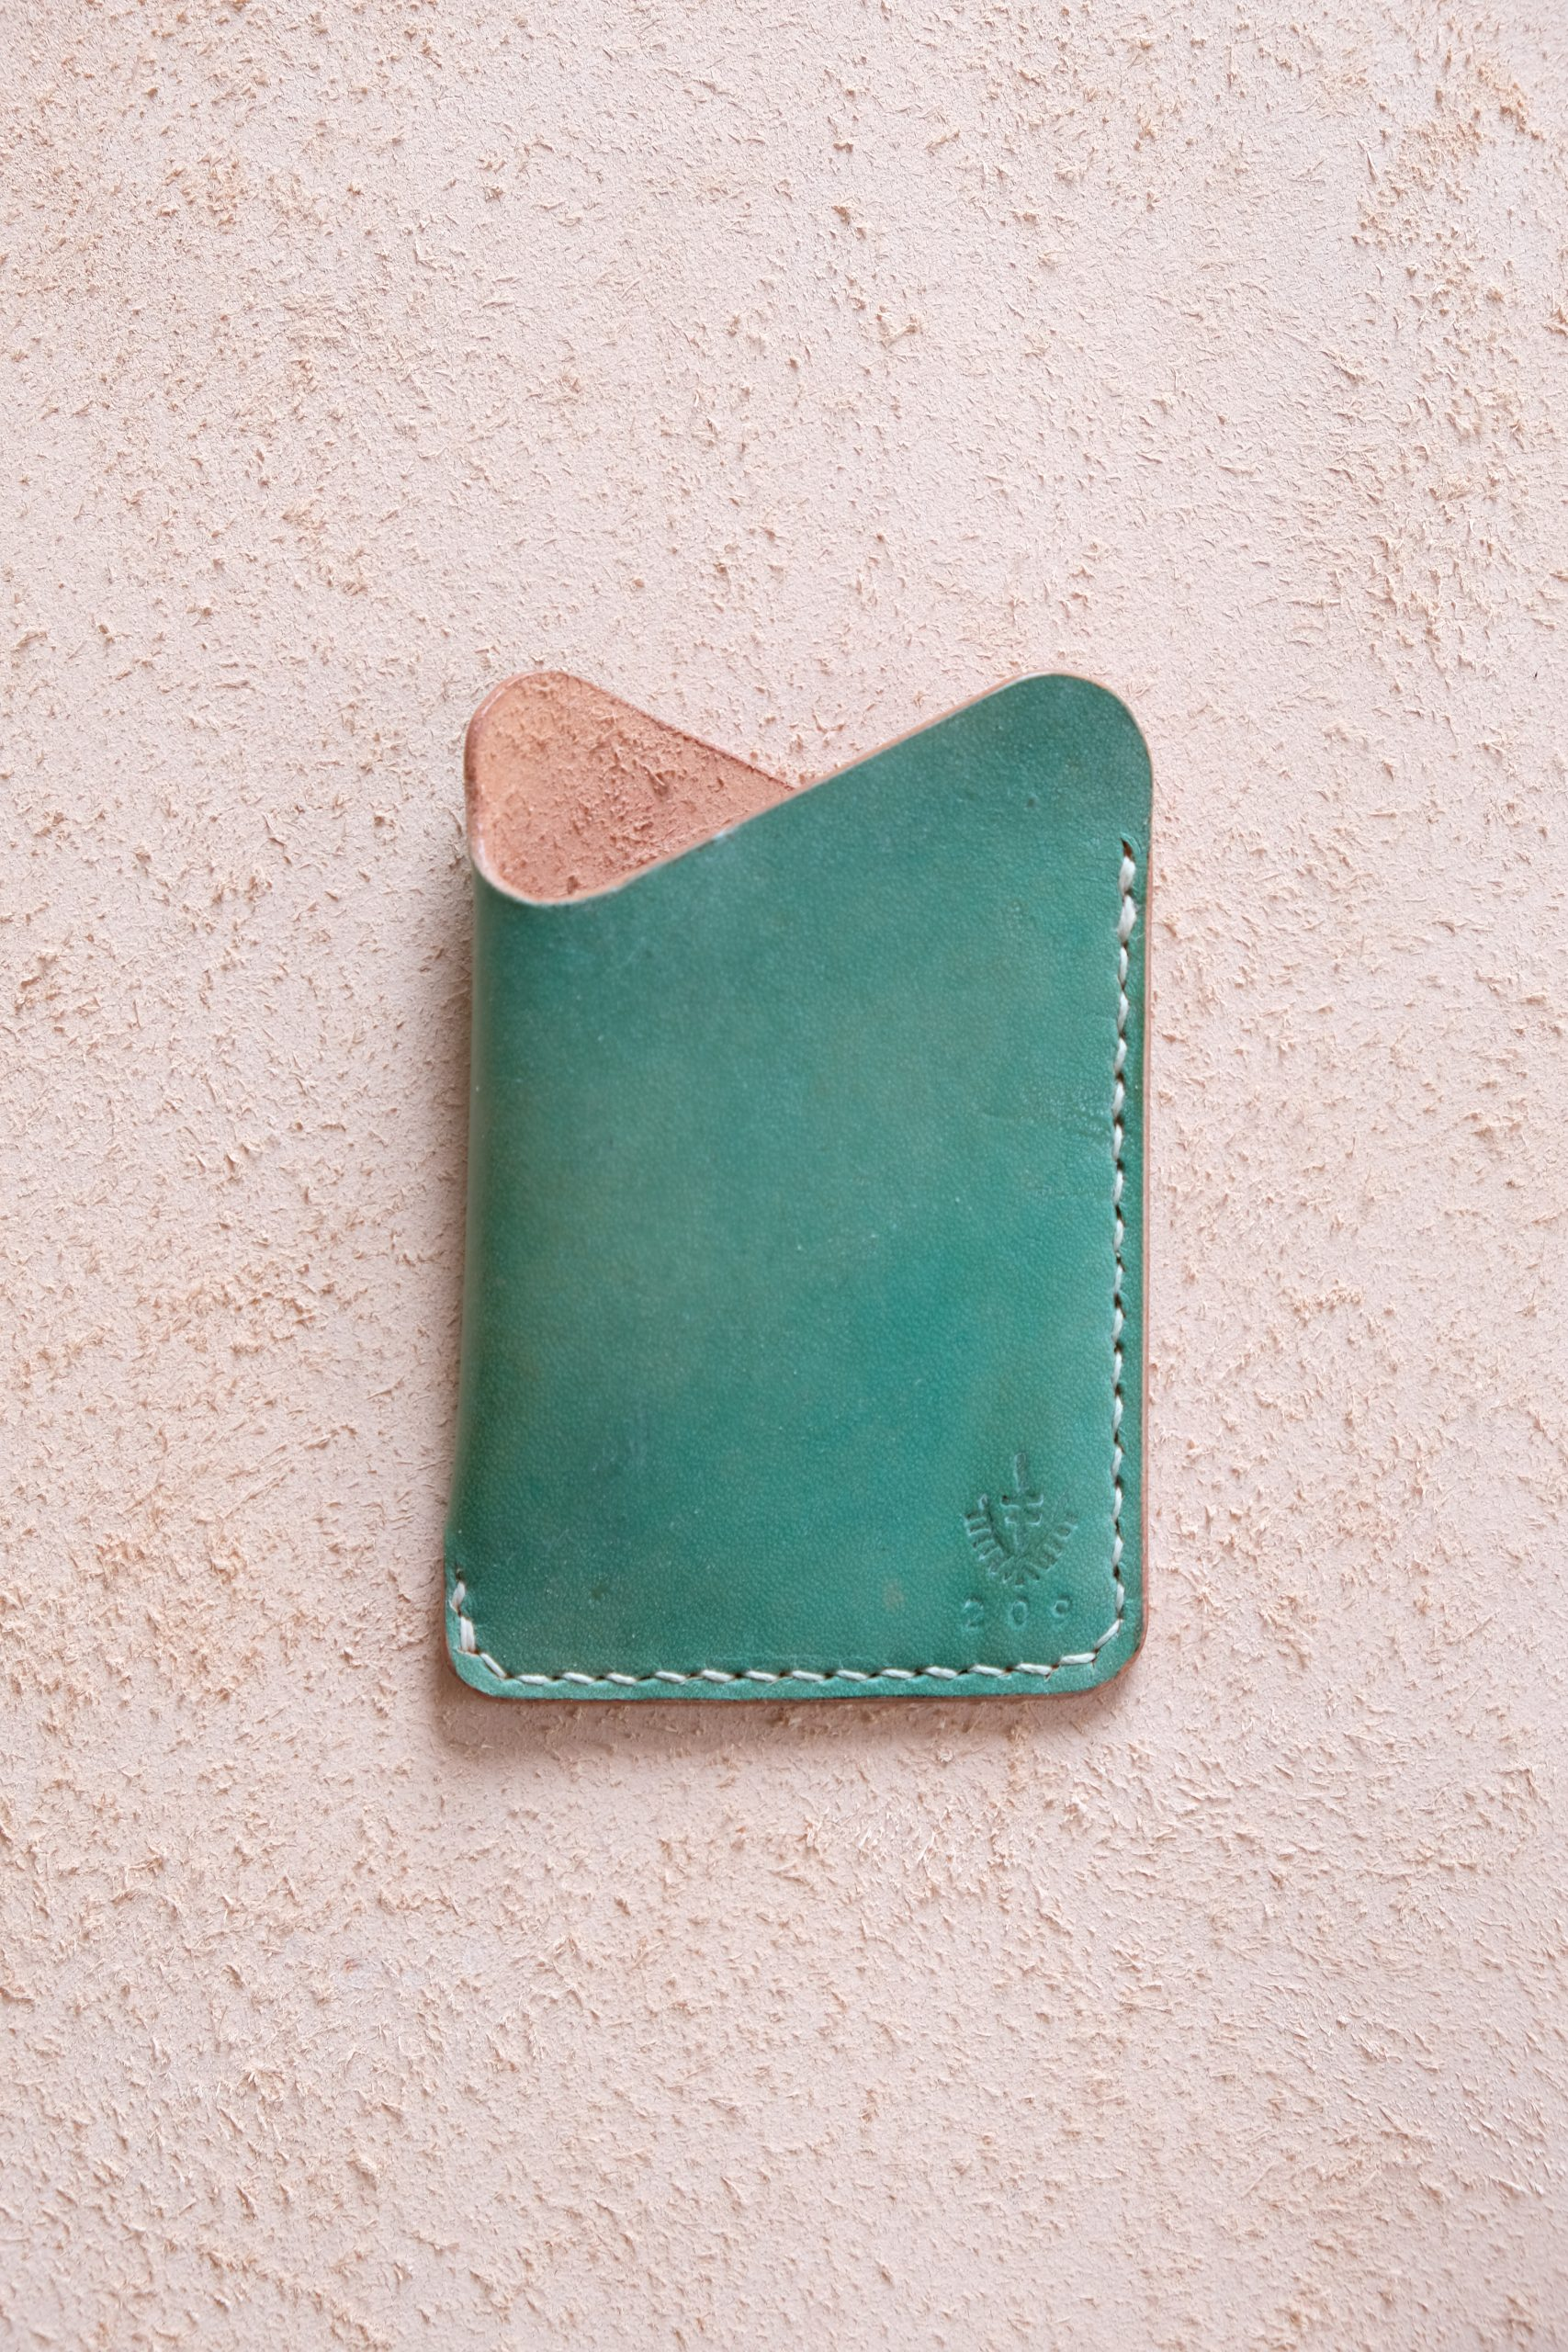 lerif designs leather wave cardholder pistachio on beige background